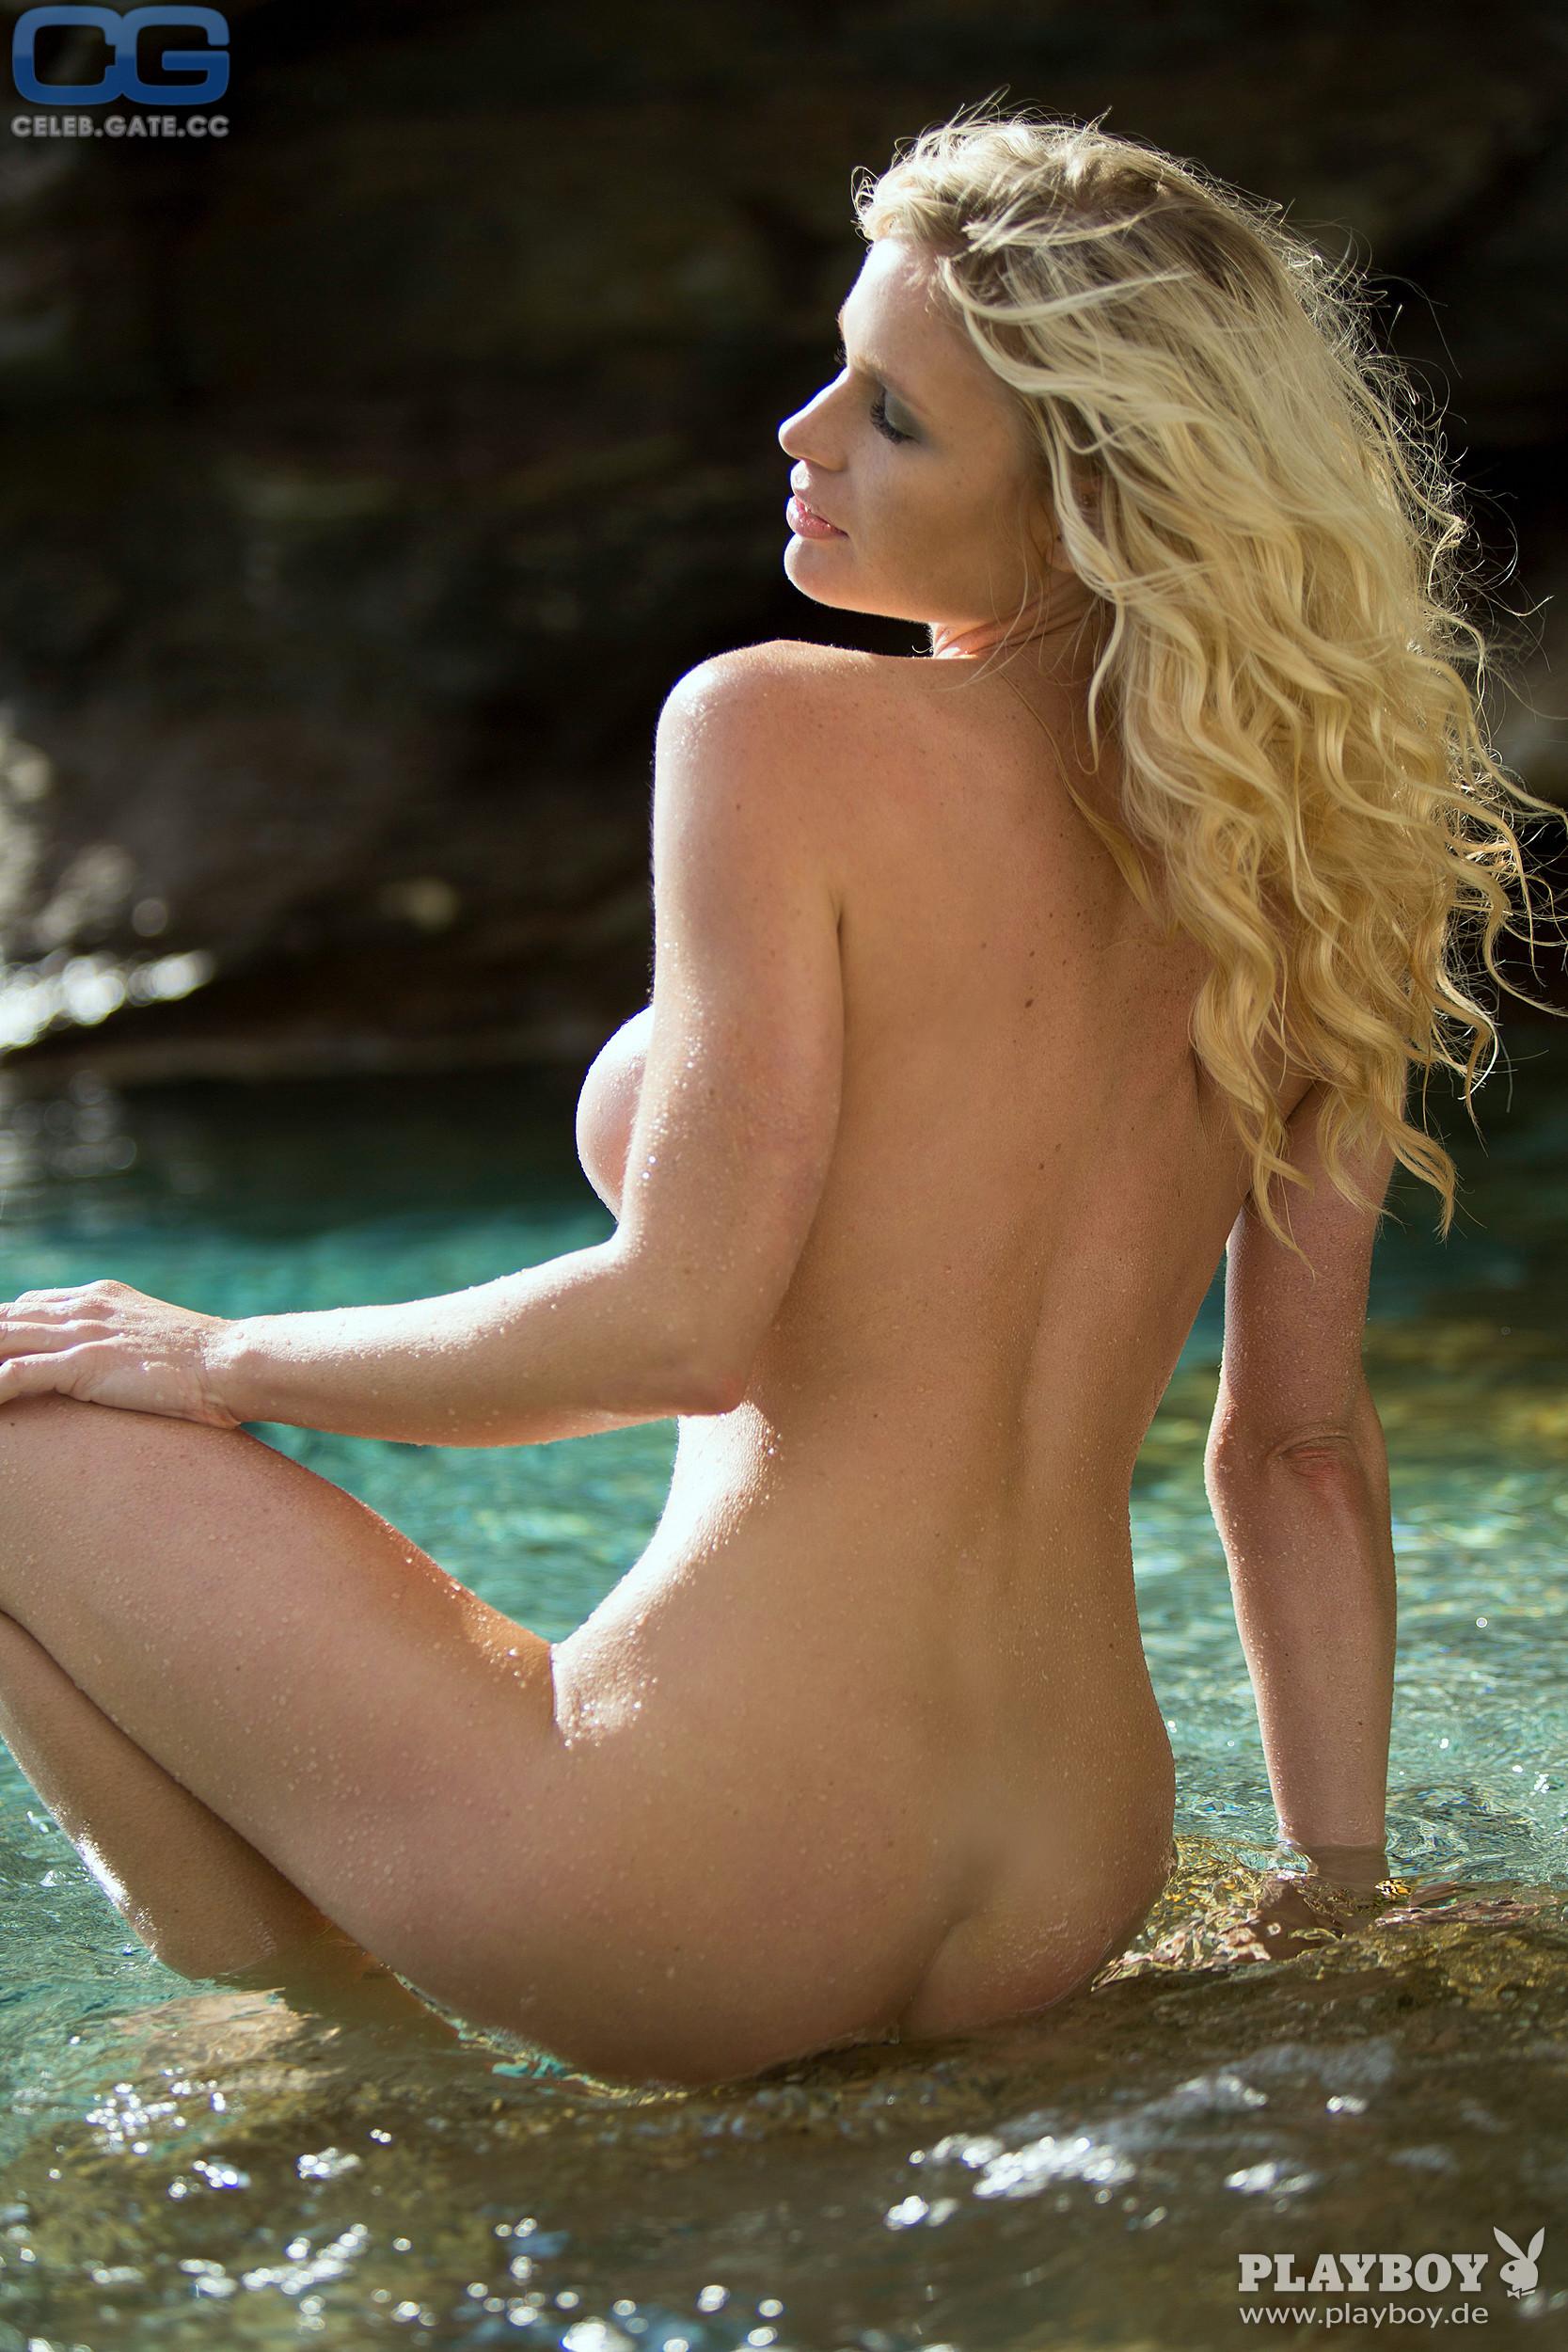 Nude ramona bernhard Ramona Bernhard